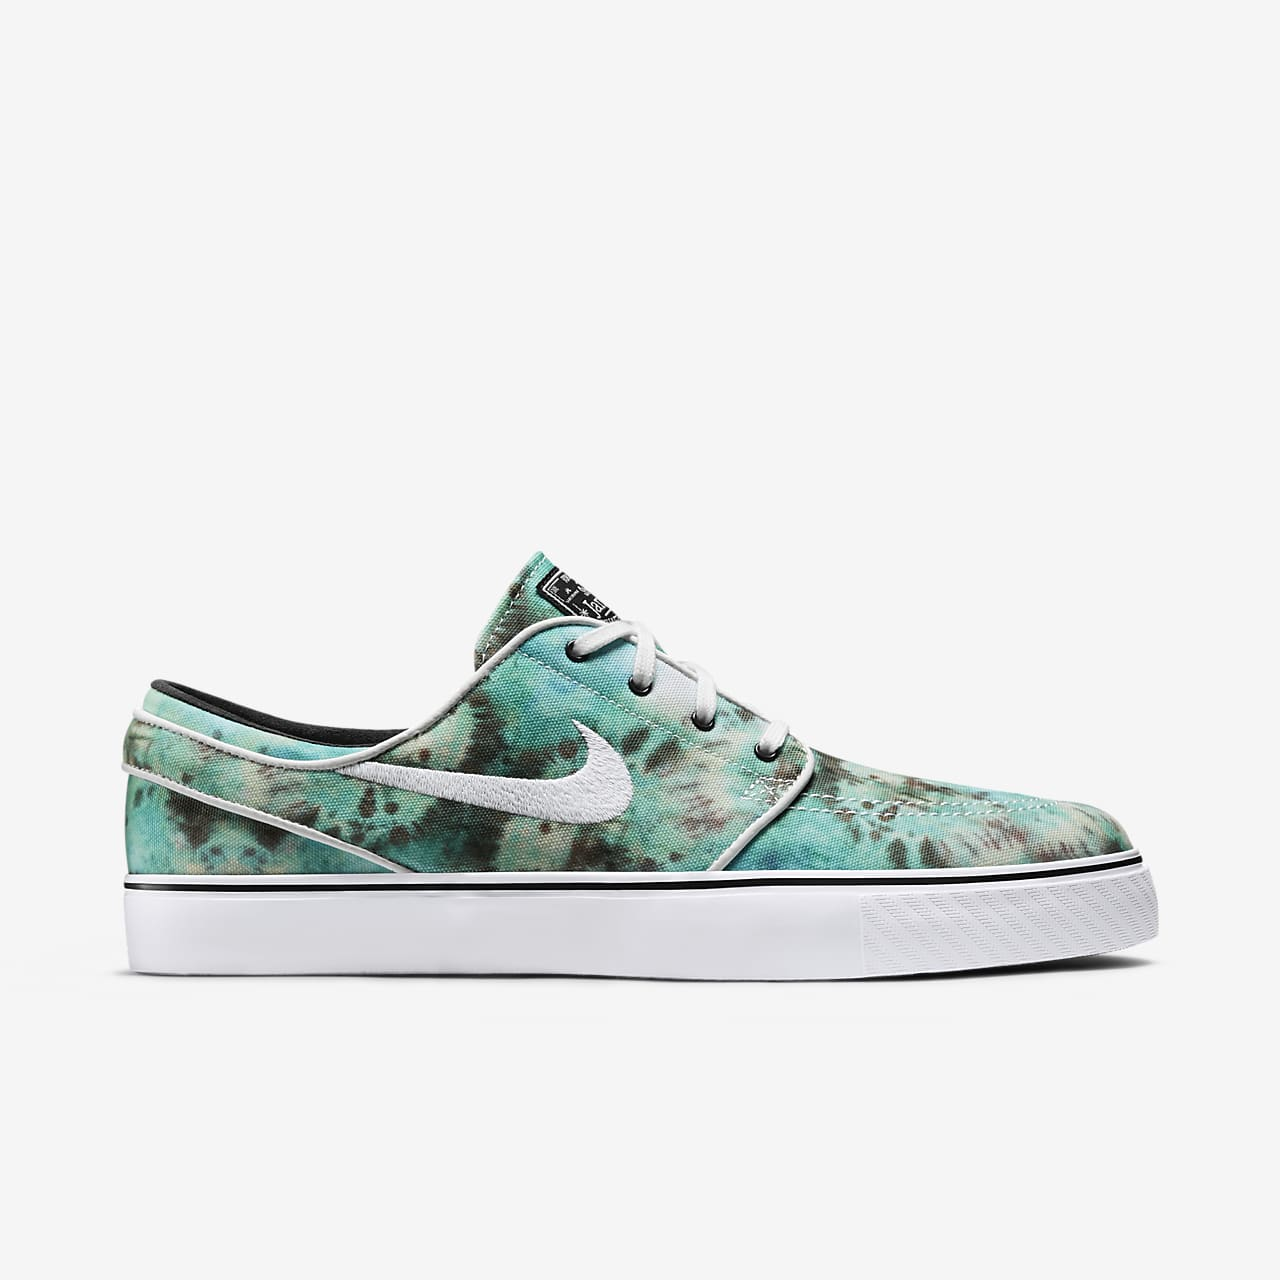 Nike Zoom Stefan Janoski Premium Men's Shoe